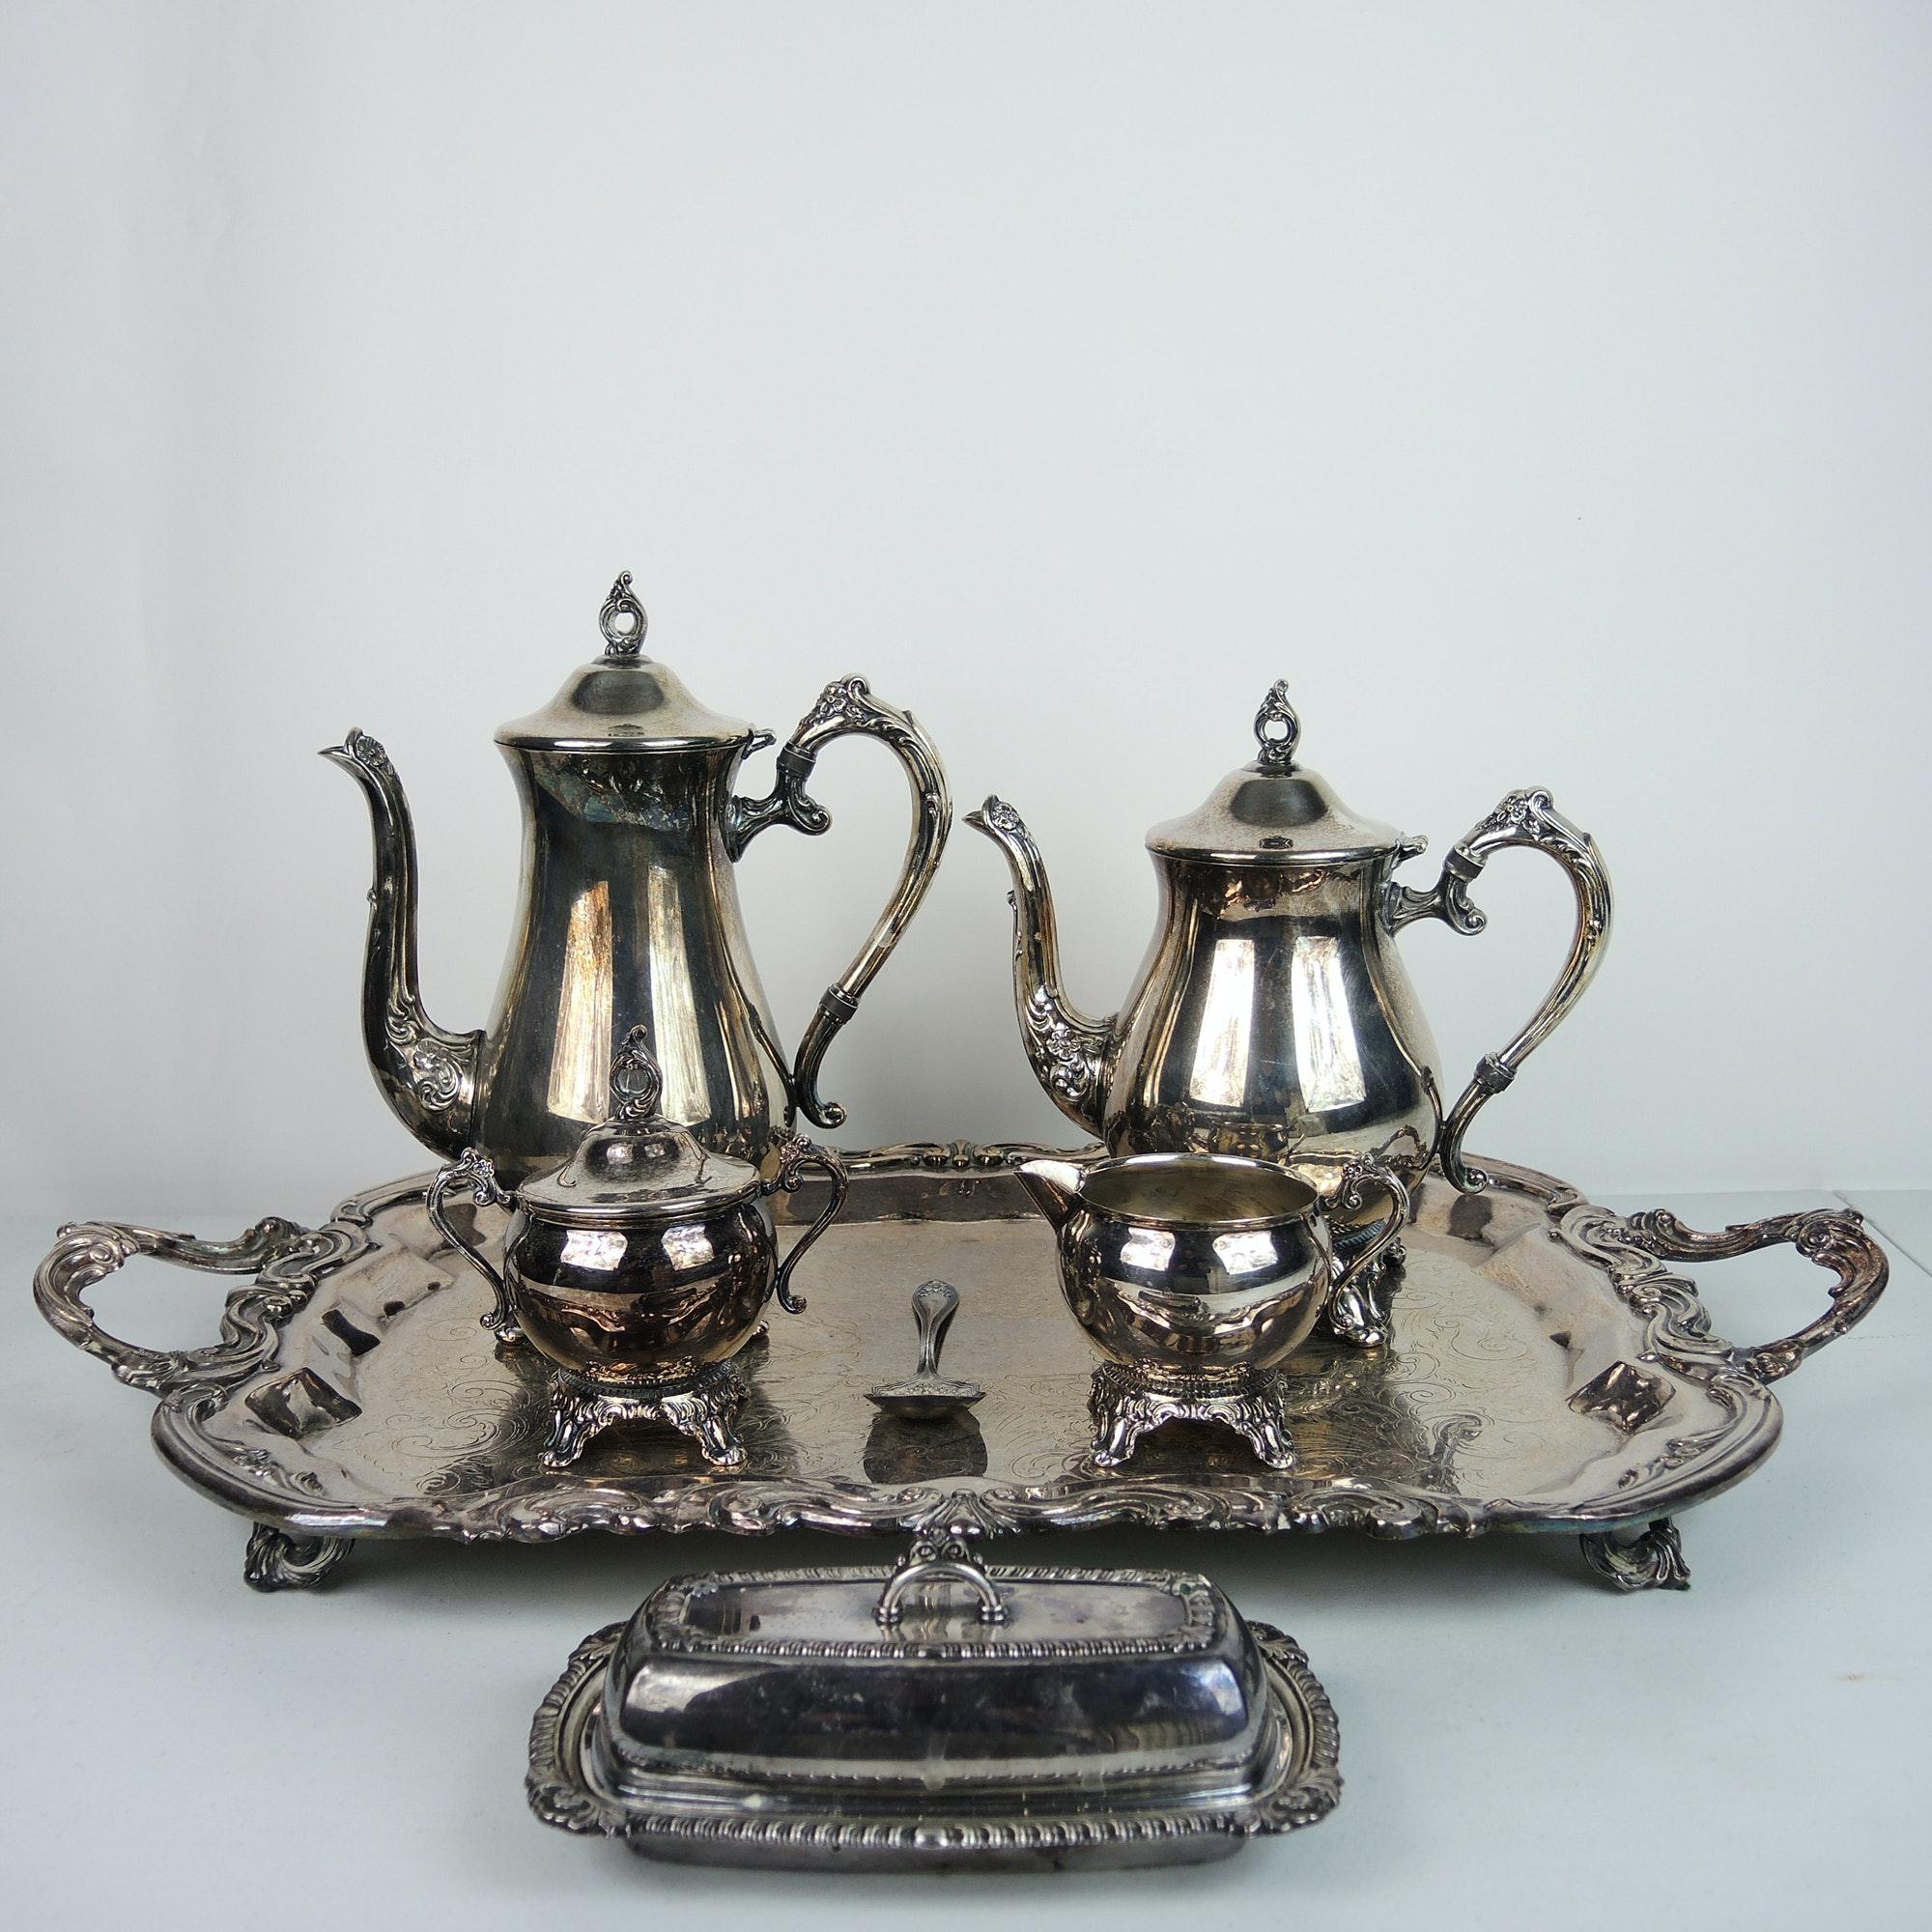 Pilgrim Silver Plate Tea Set and More